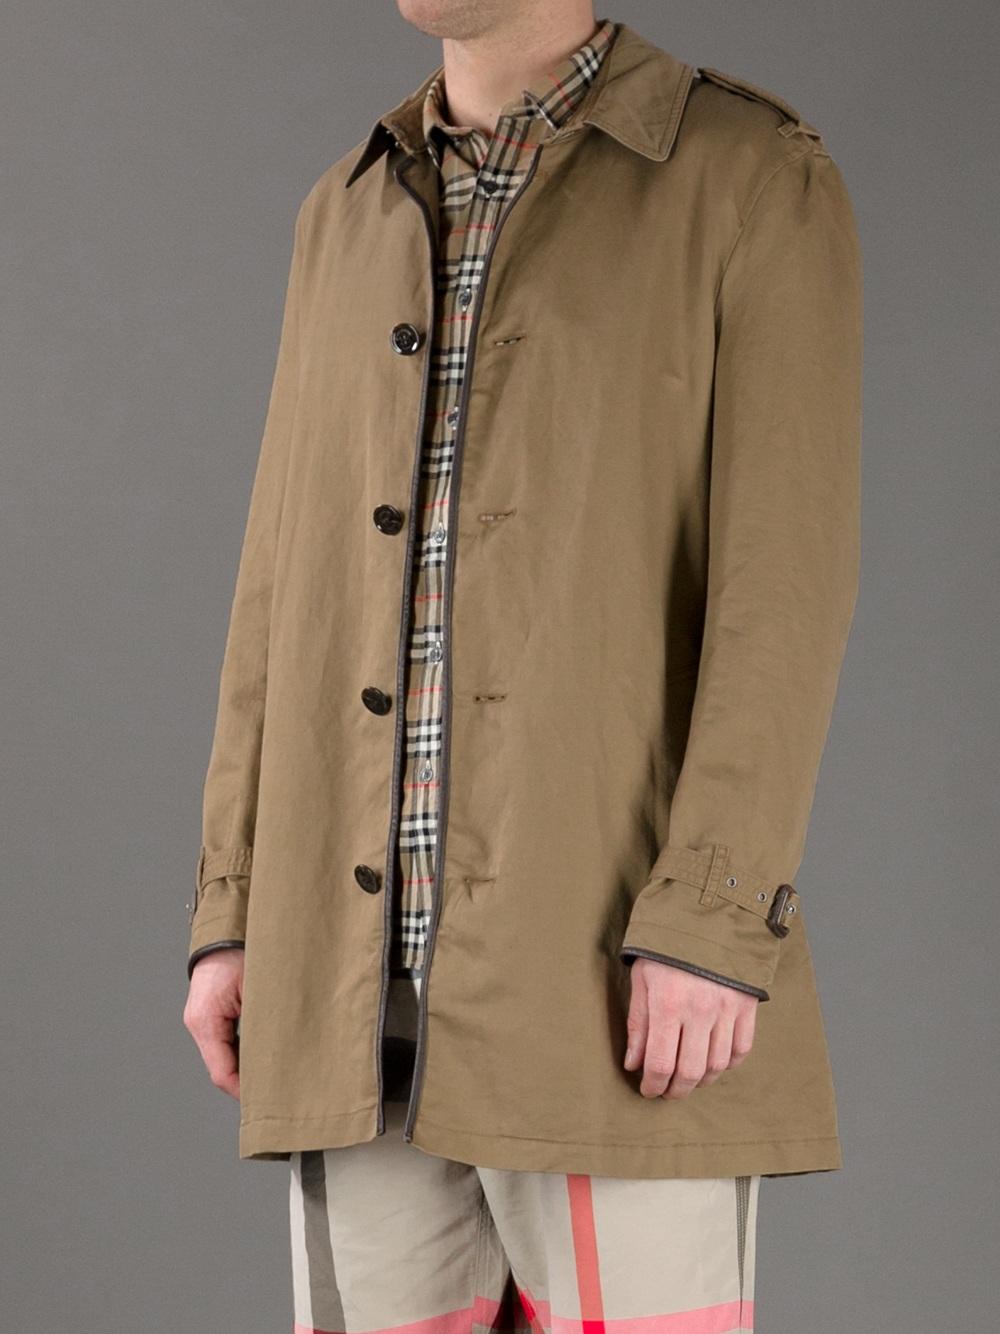 lyst burberry brit brixton trench coat in natural for men. Black Bedroom Furniture Sets. Home Design Ideas